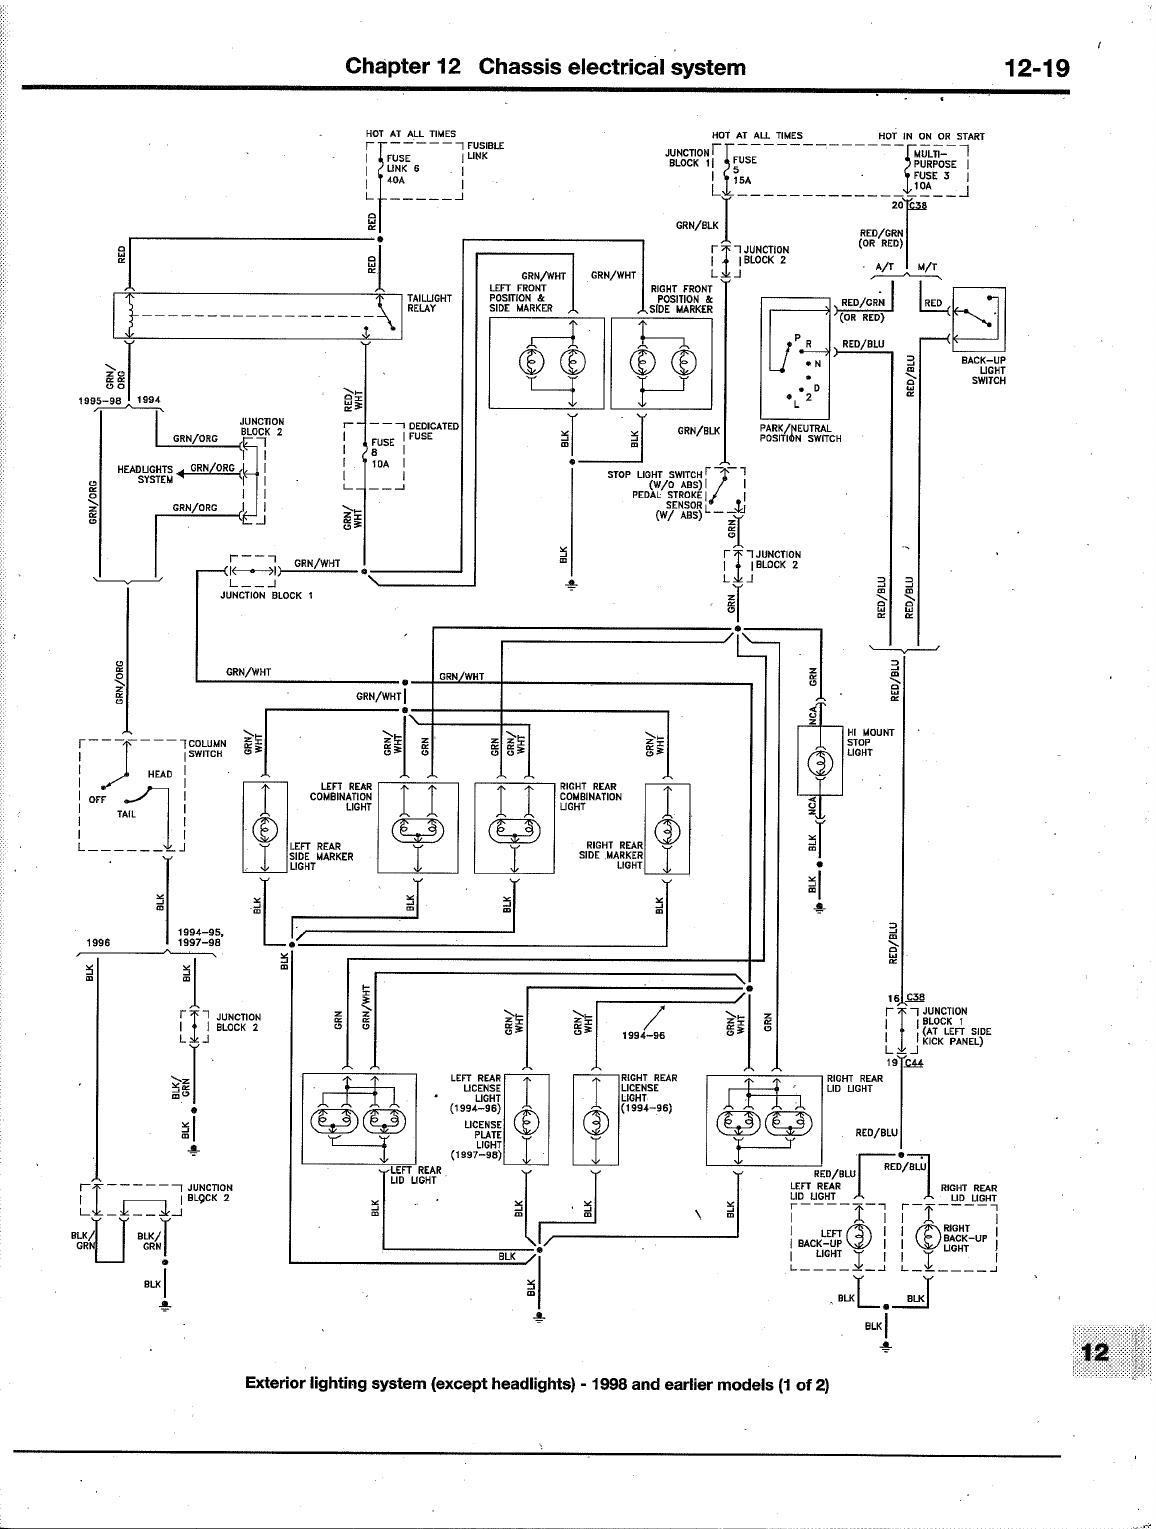 2003 Mitsubishi Galant Wiring Diagram : 2002 Mitsubishi